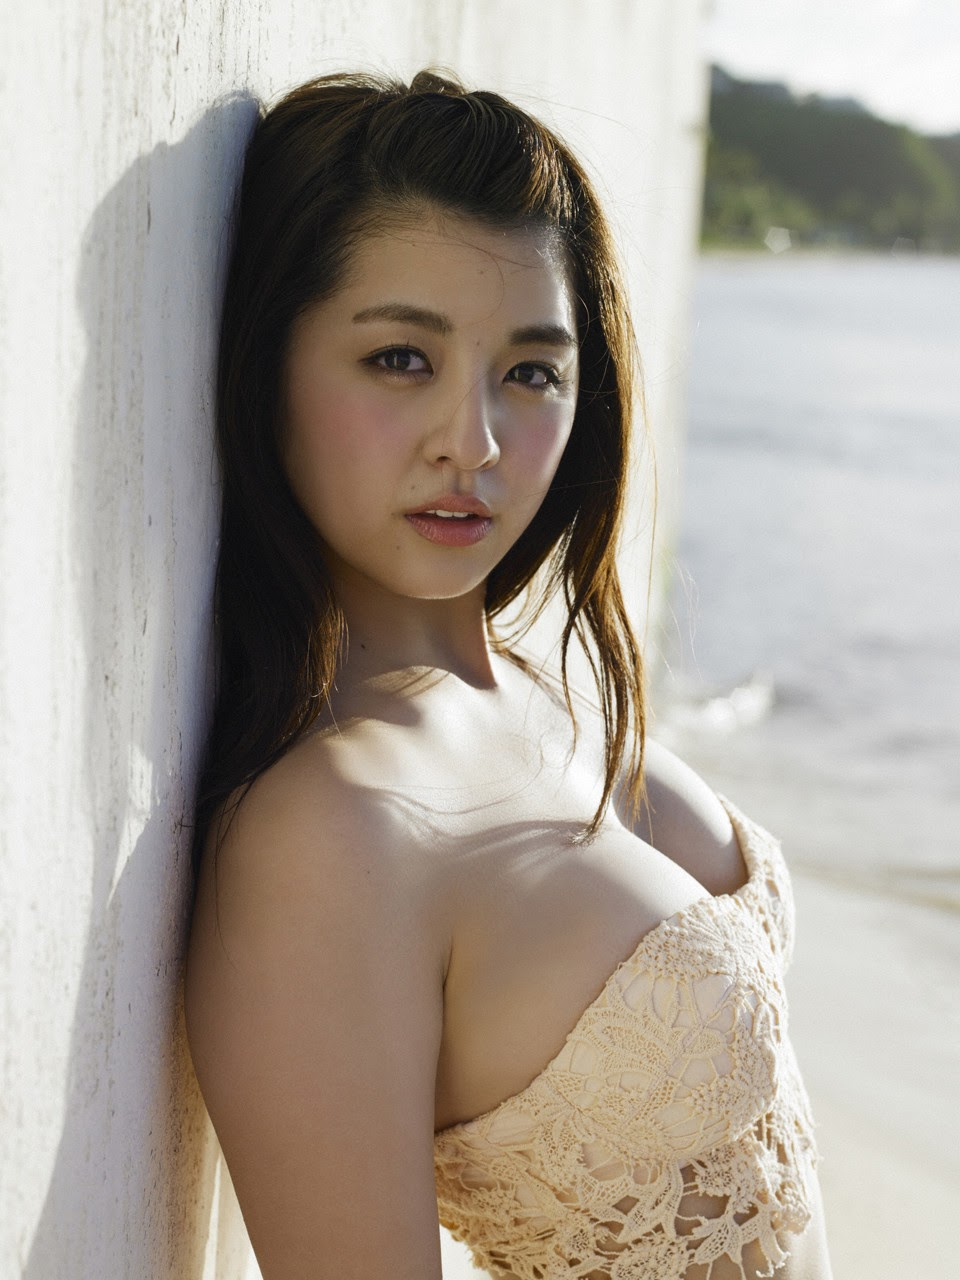 Bikini on a white sandy beach060